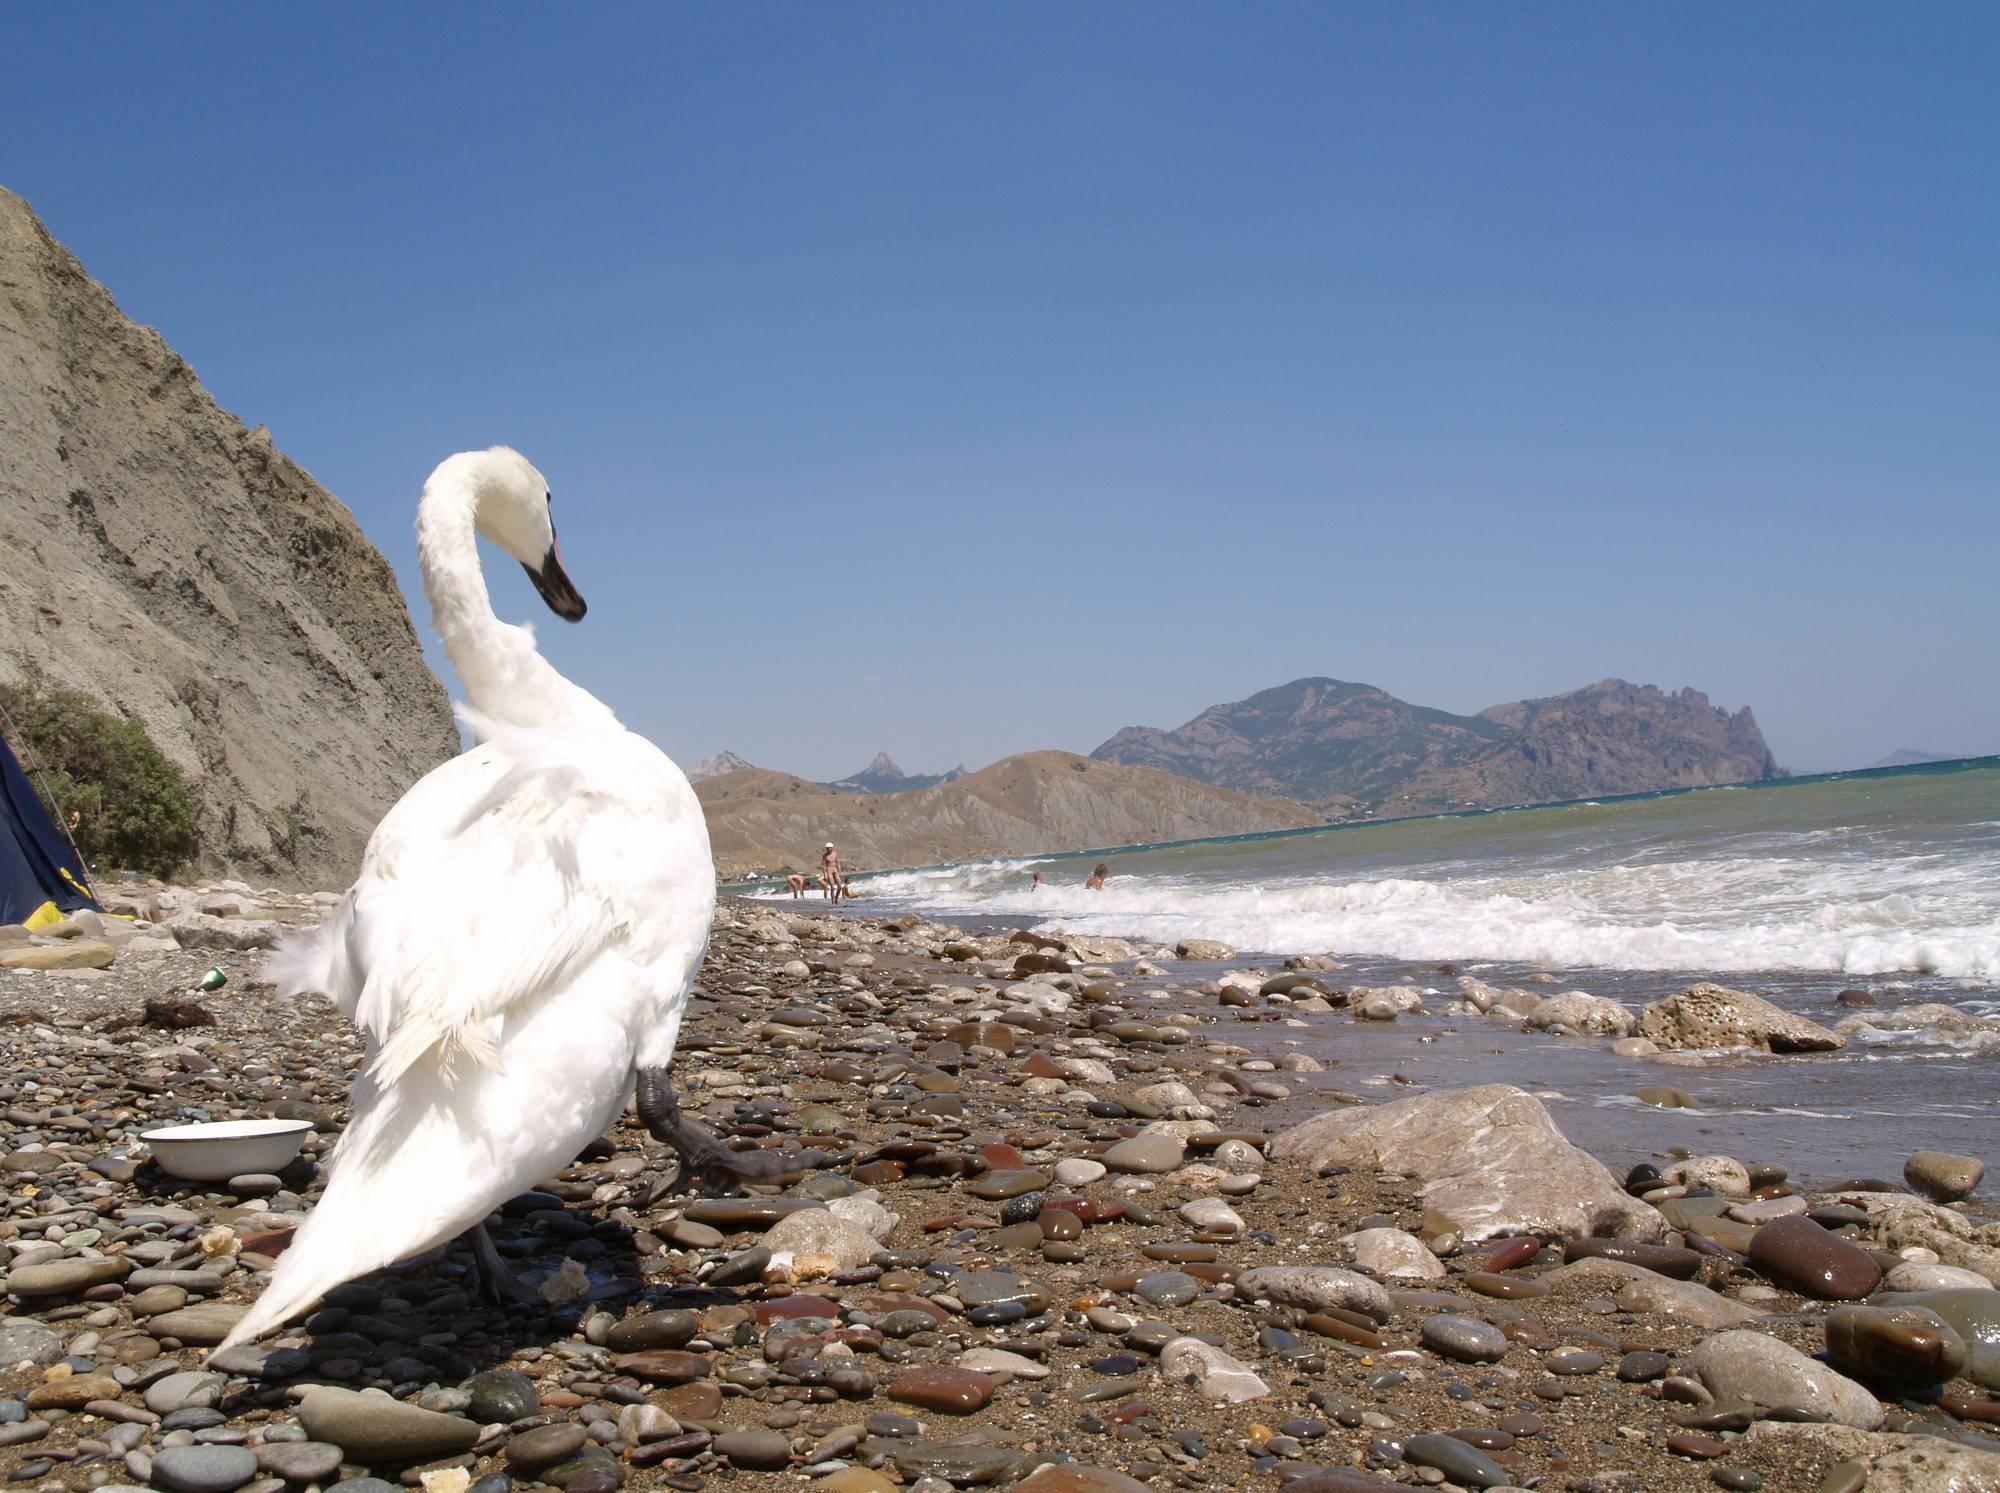 Nudist Photos Nude Ocean Swan Beauty - 1